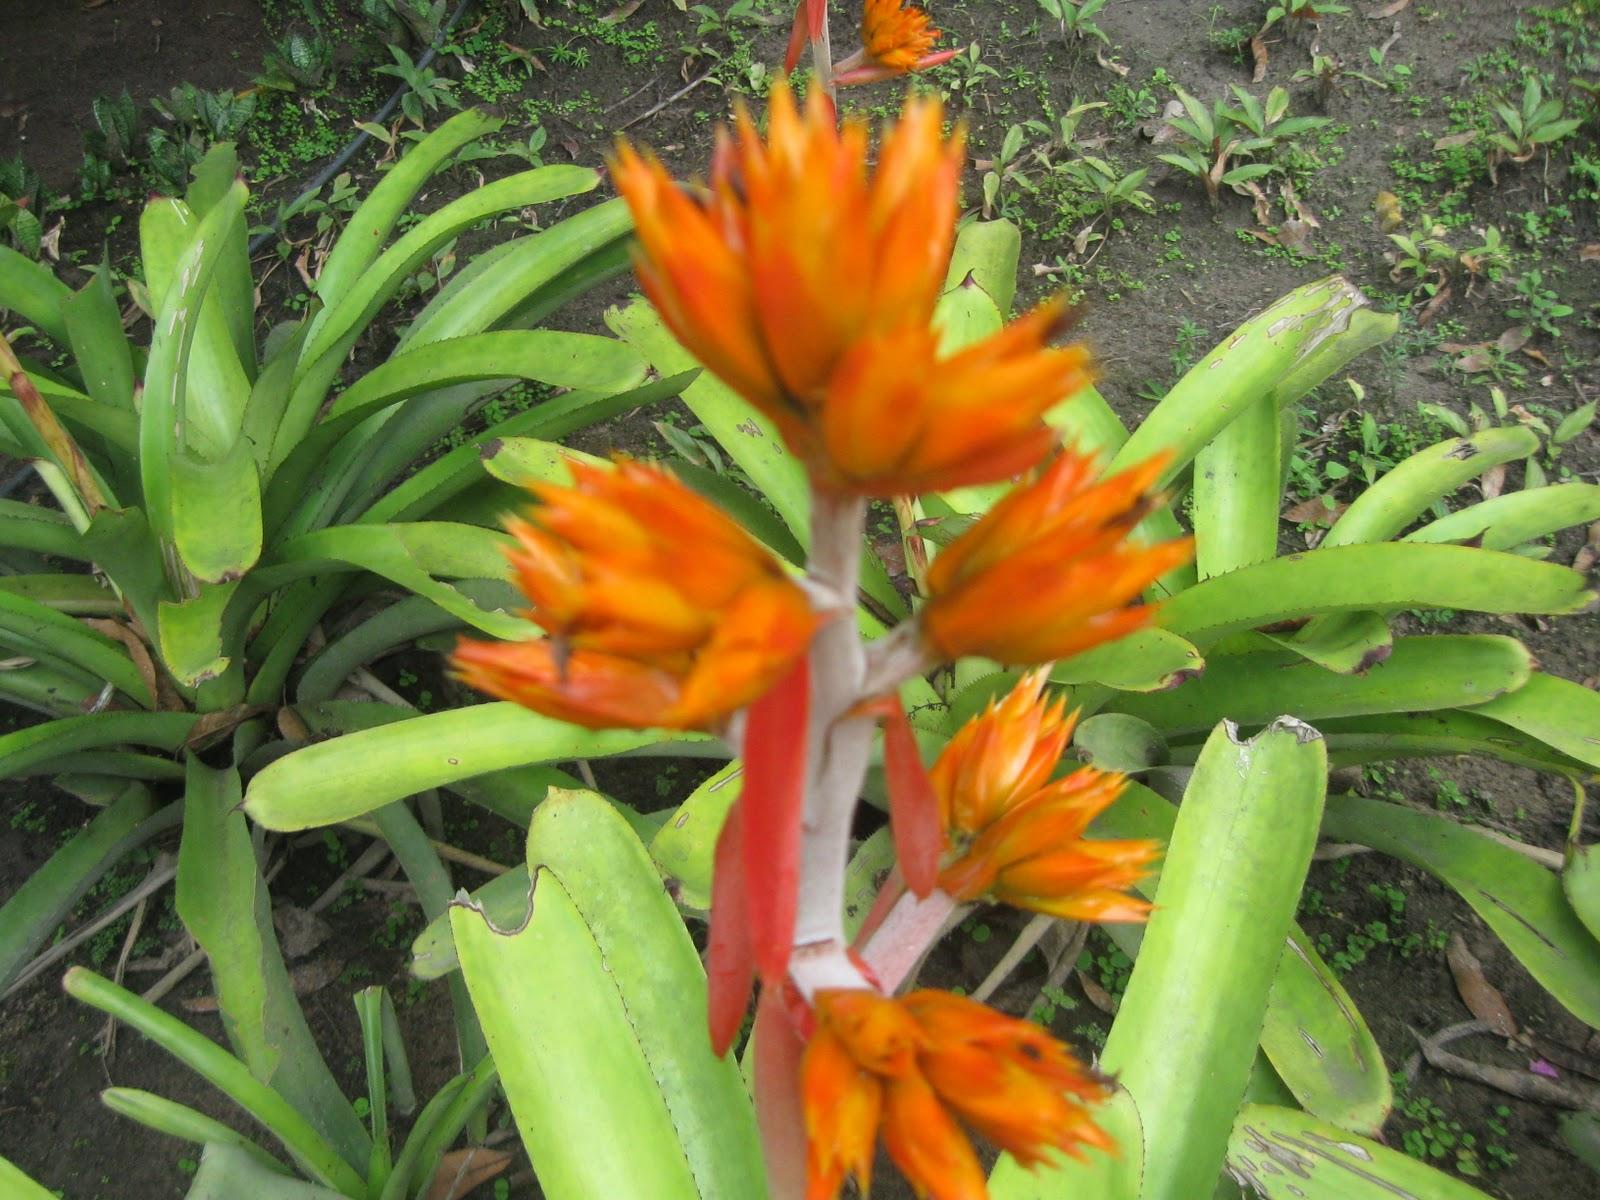 flores tropicais jardim : flores tropicais jardim:Flores tropicais, jardim natural